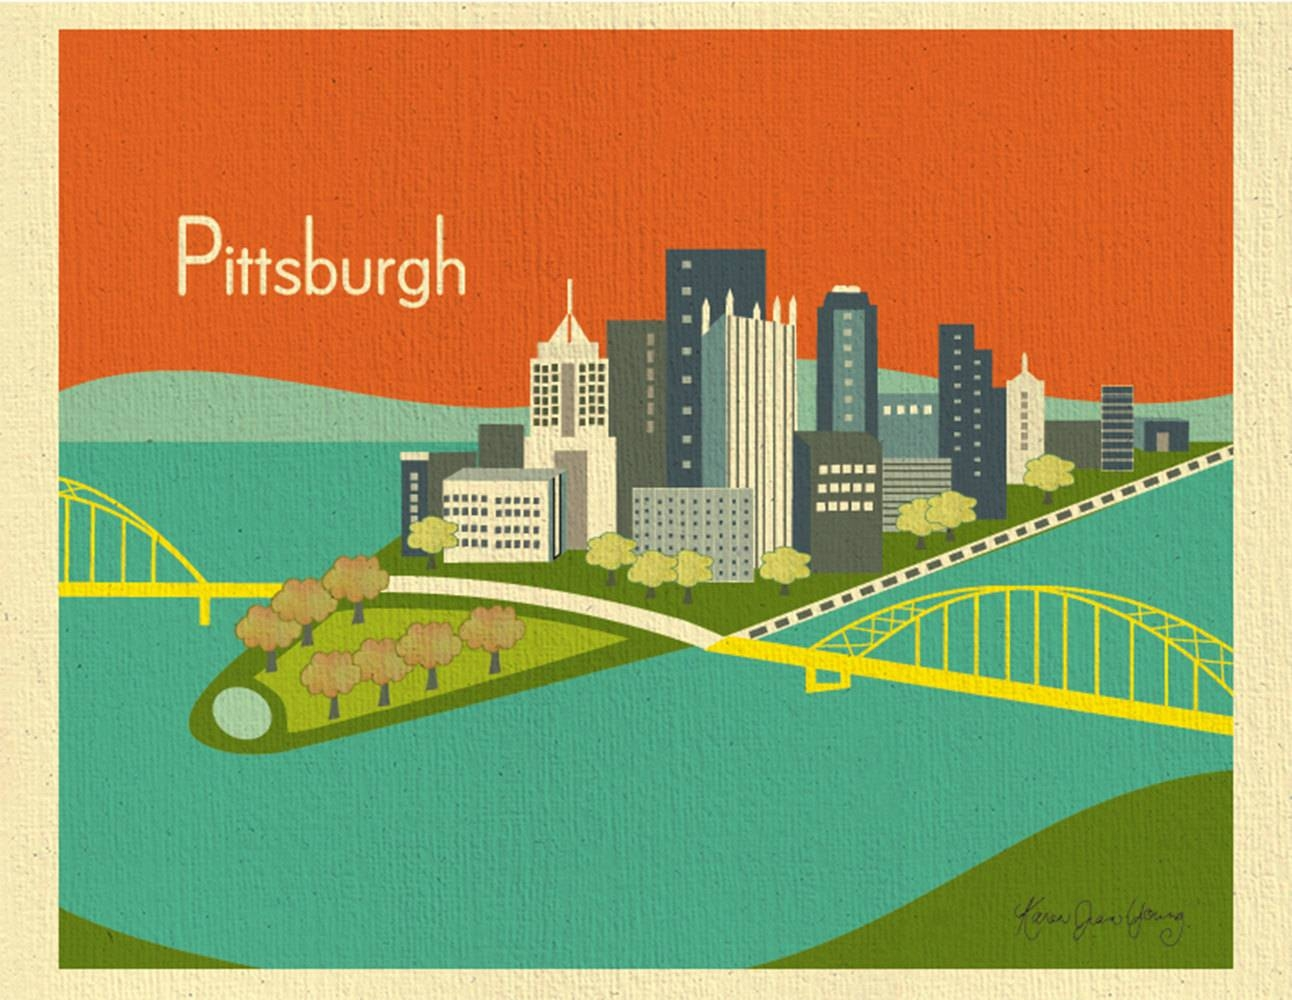 Pittsburgh Skyline Print Pittsburgh Wall Art Pittsburgh For Latest Pittsburgh Map Wall Art (View 13 of 20)